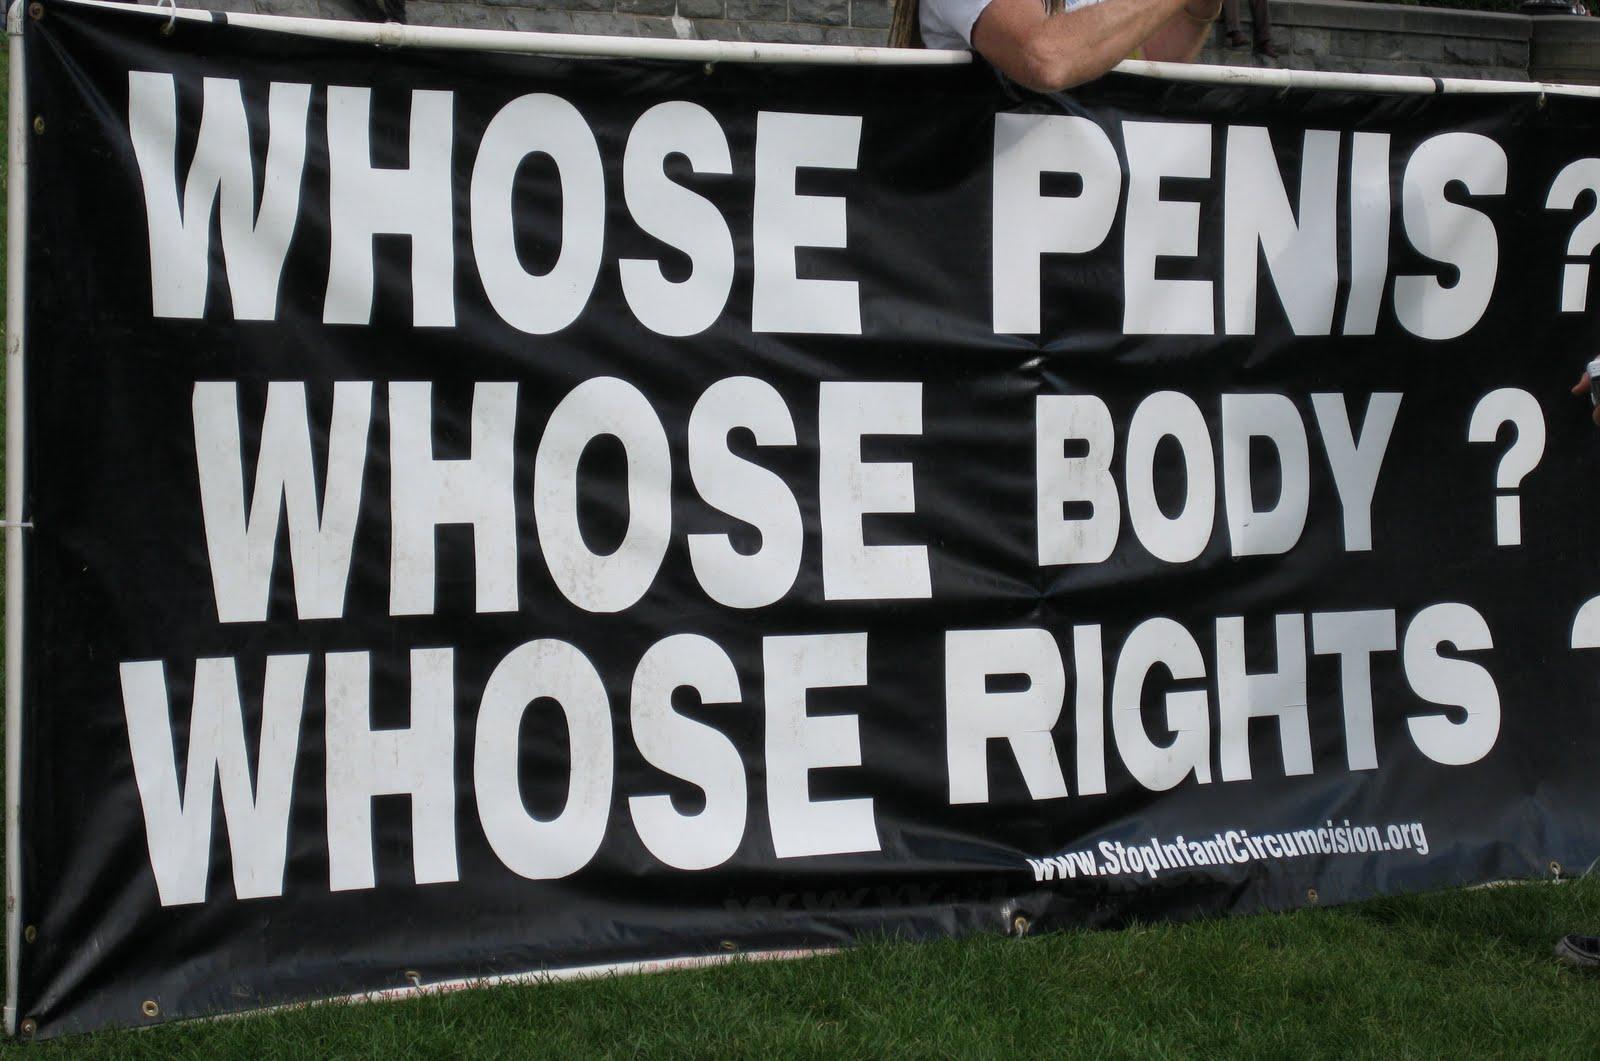 genital rights